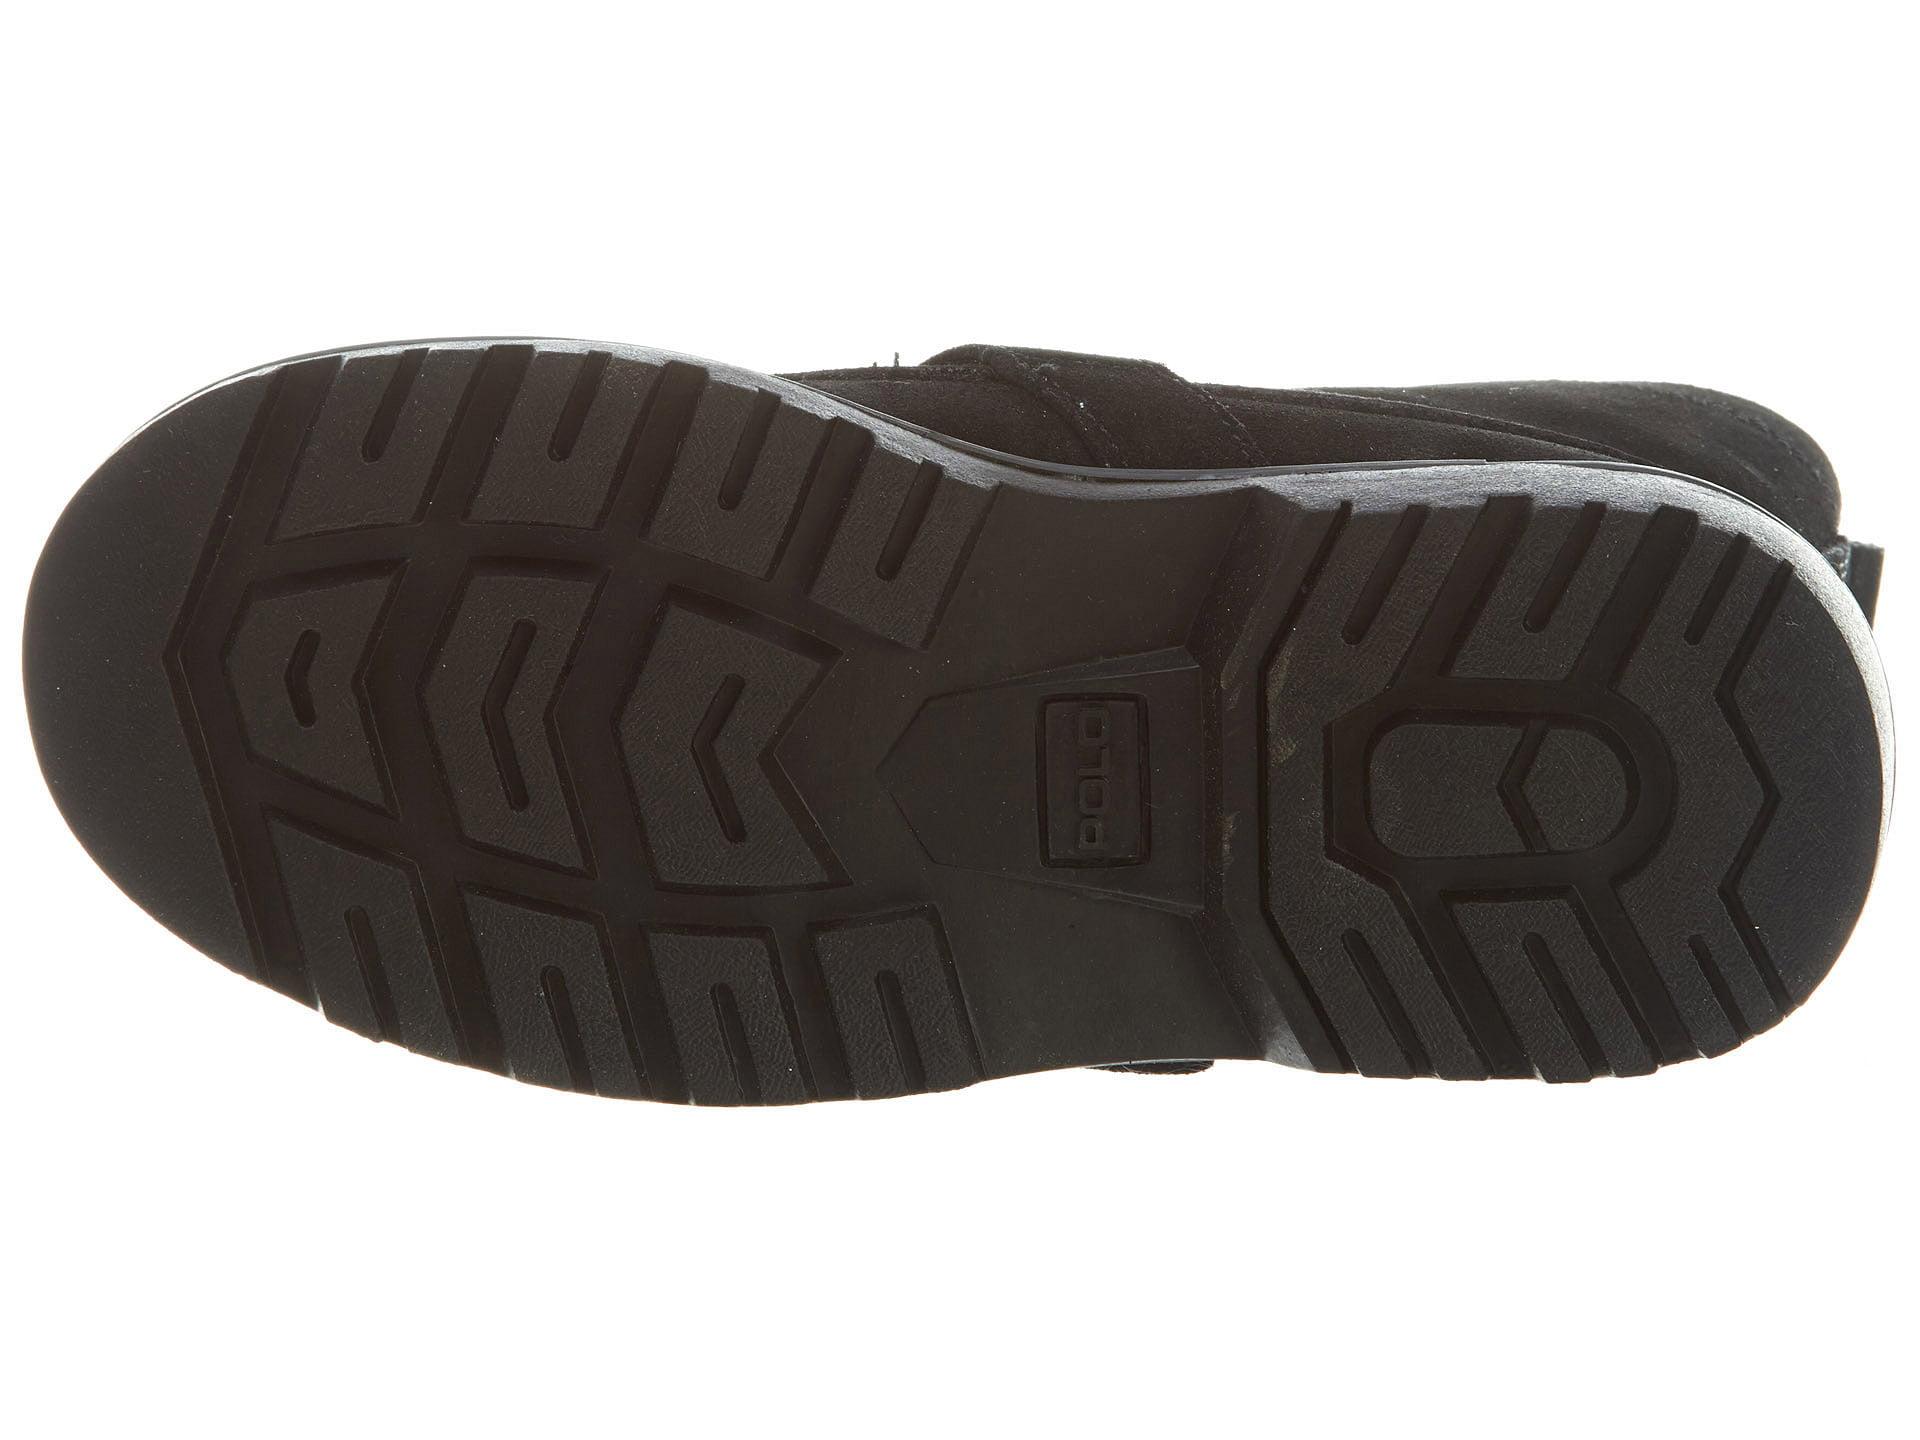 Polo Ralph Lauren Range Hi Boots Little Kids Style # 97673